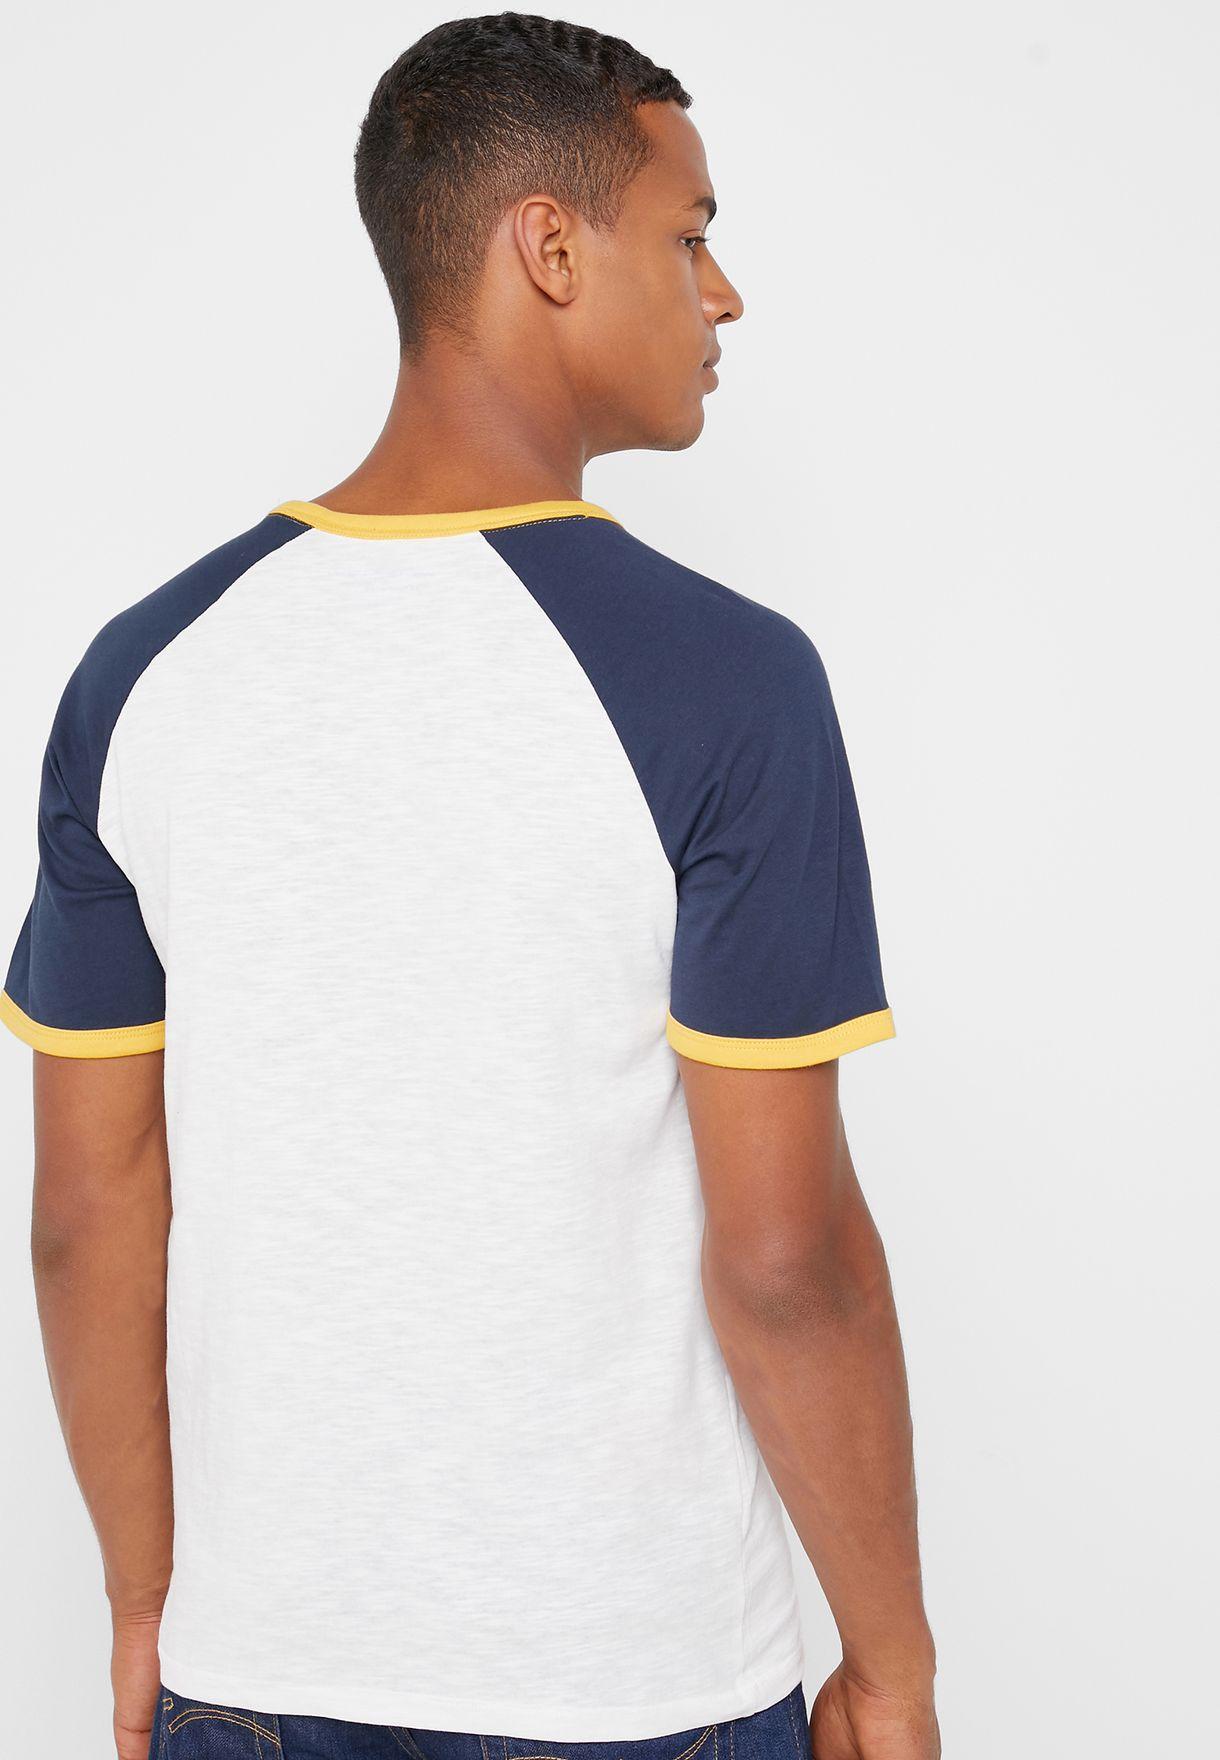 Retro Raglan Crew Neck T-Shirt